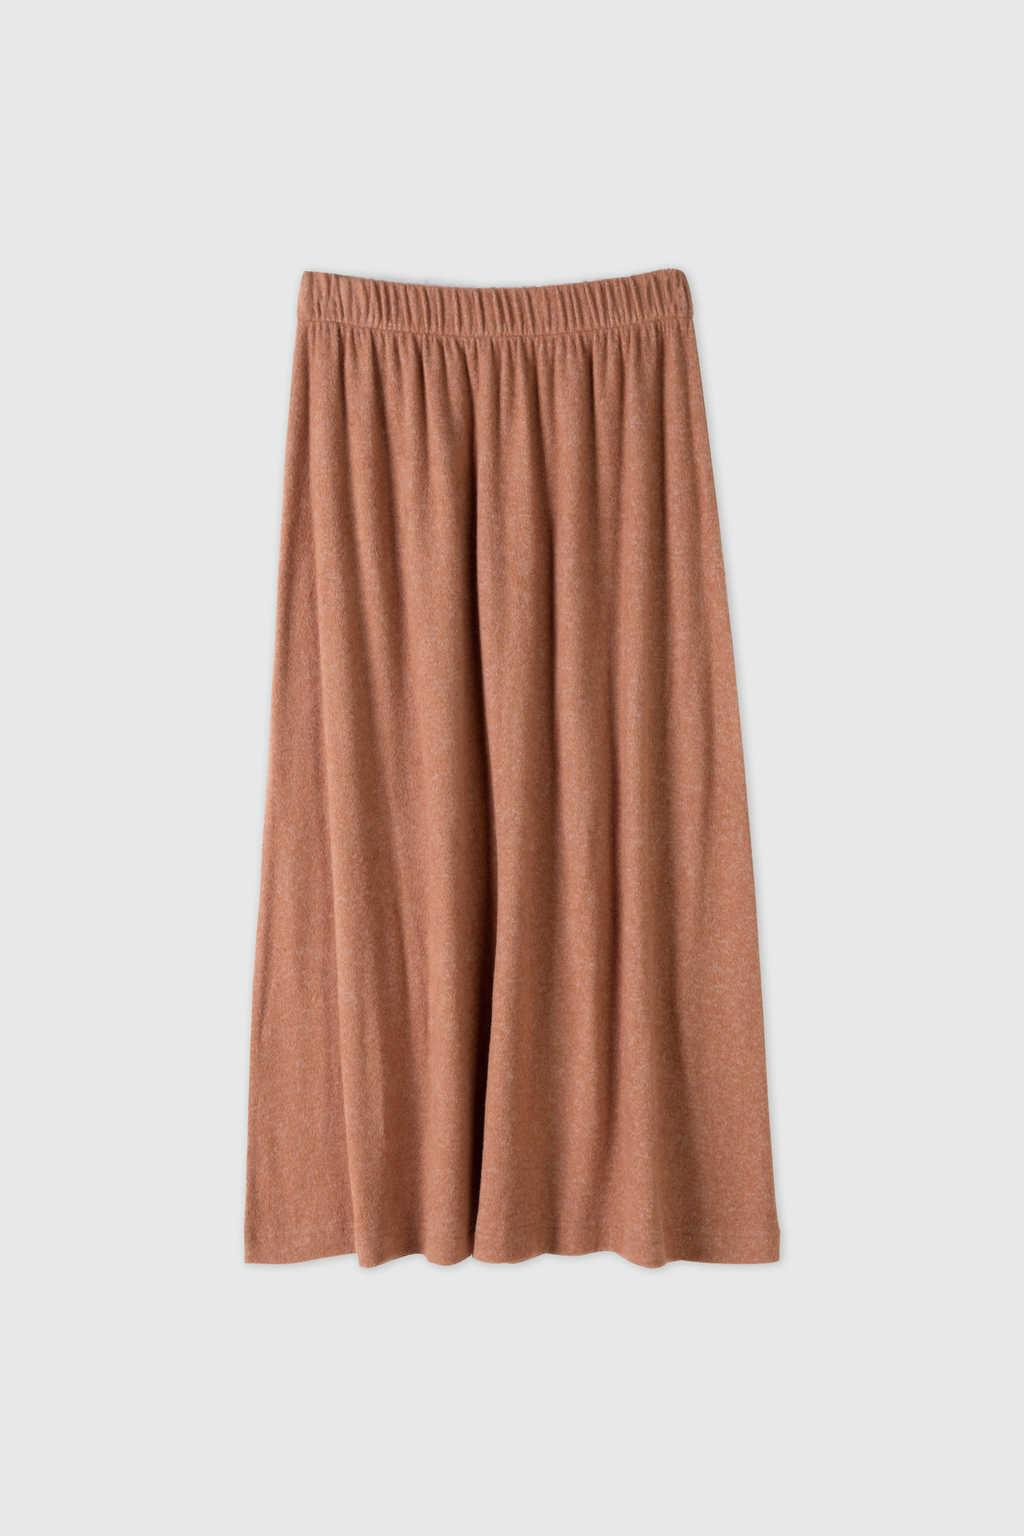 Skirt 2701 Pink 5